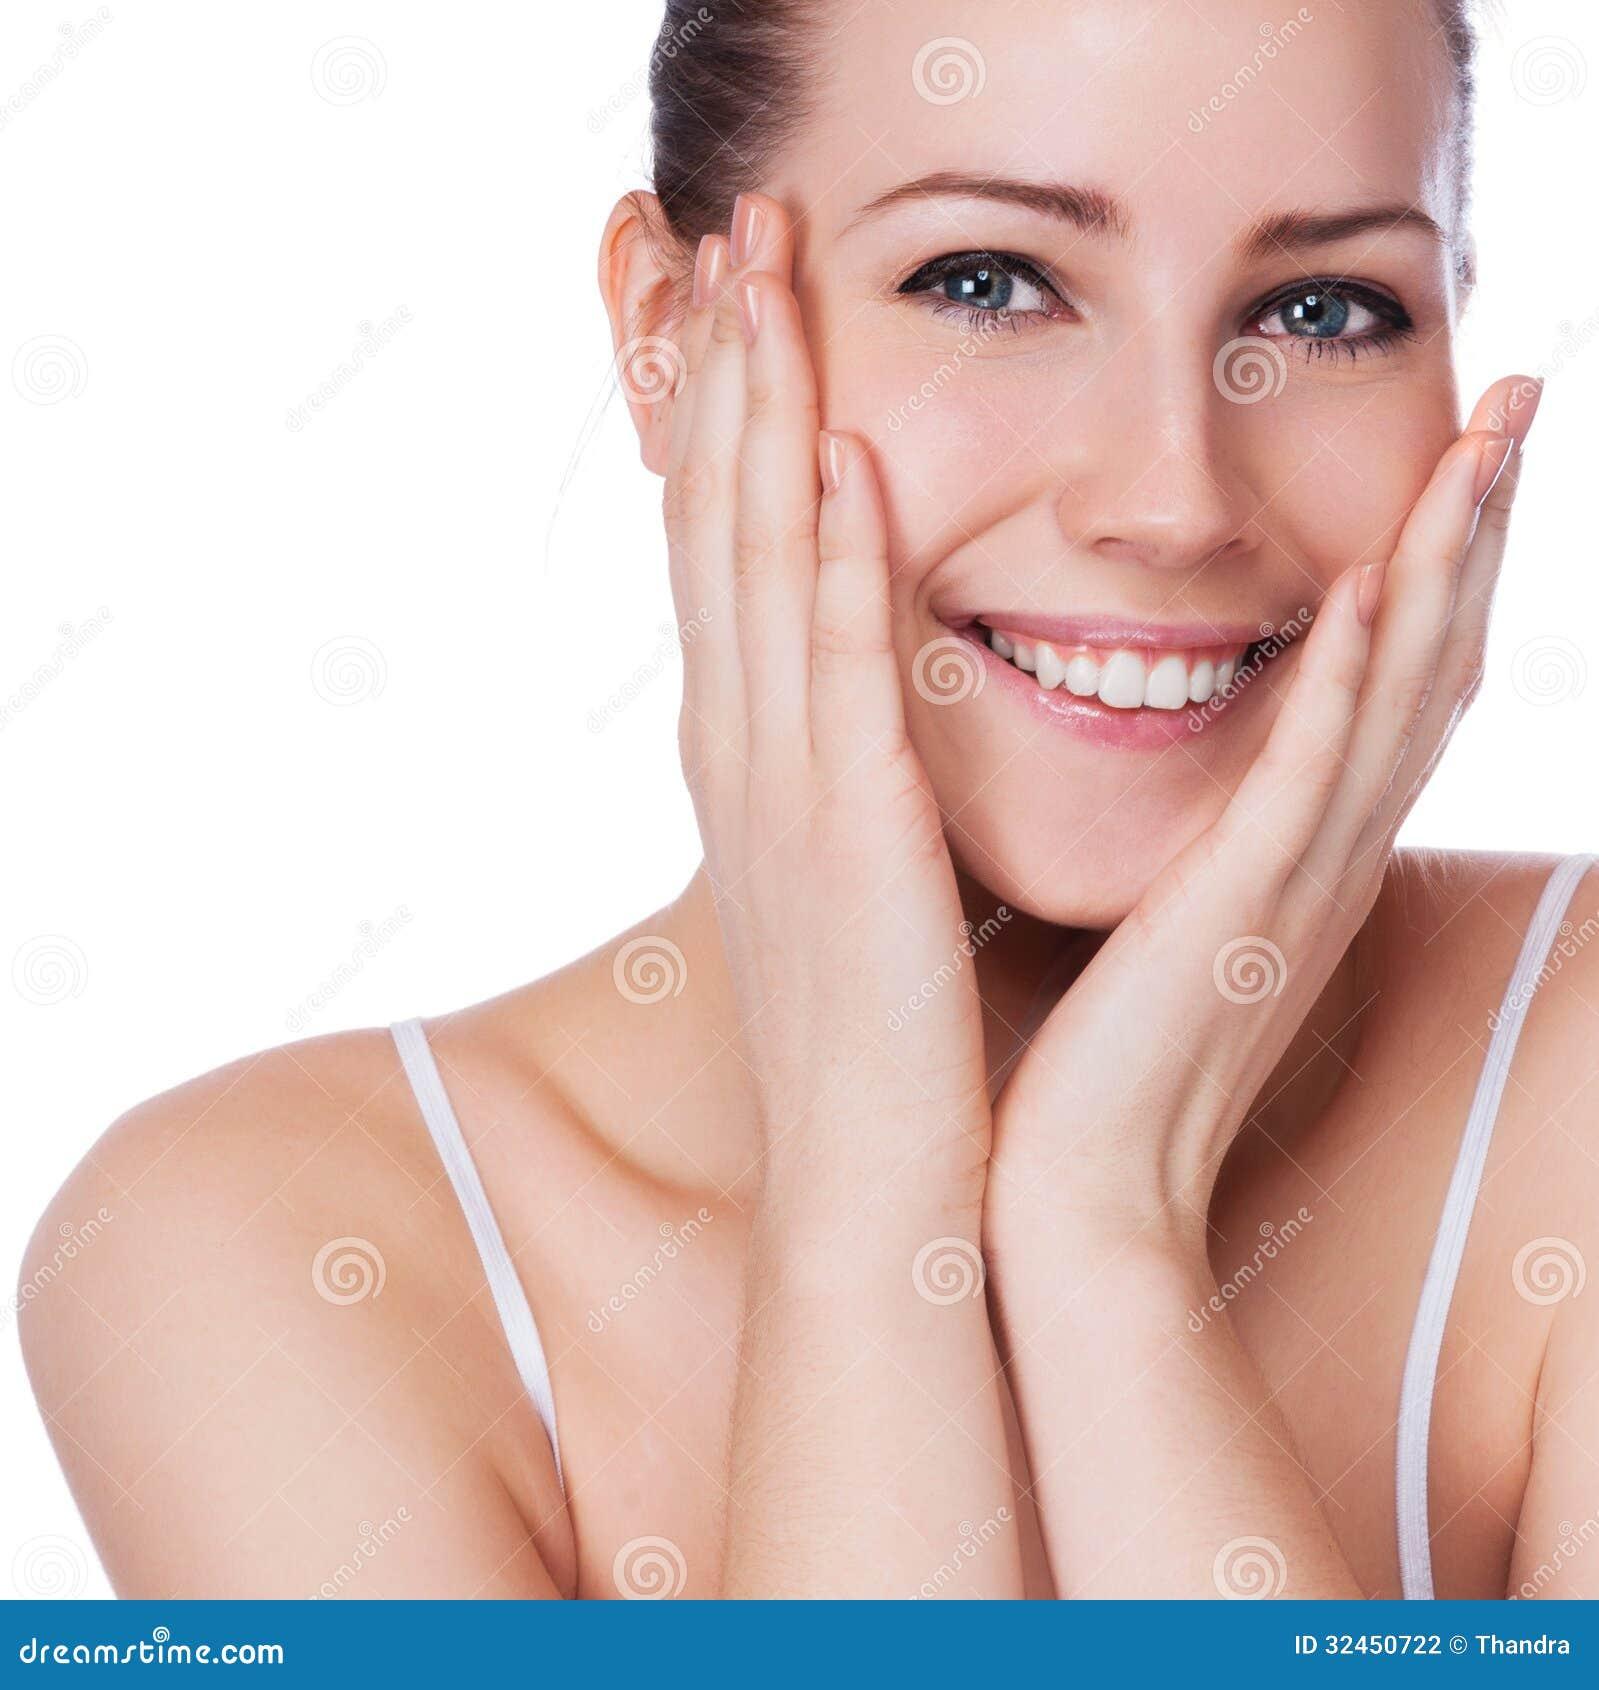 Beau visage de jeune femme adulte avec la peau fraîche propre